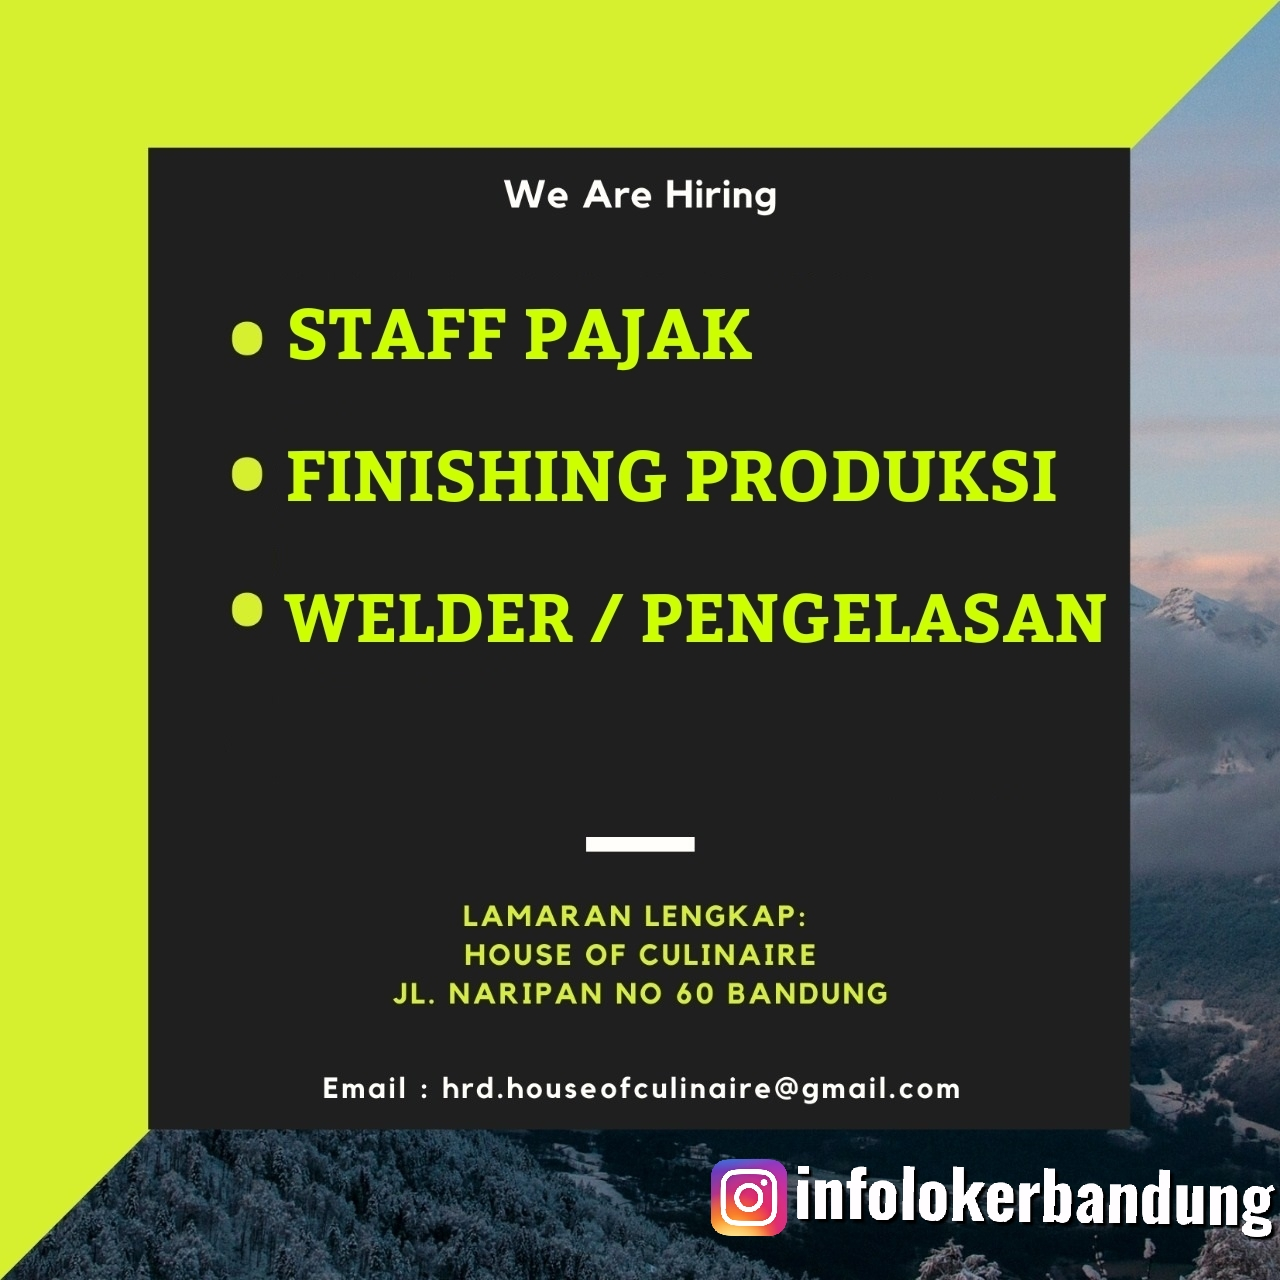 Lowongan Kerja House Of Culinaiere ( HOC ) Bandung Maret 2020